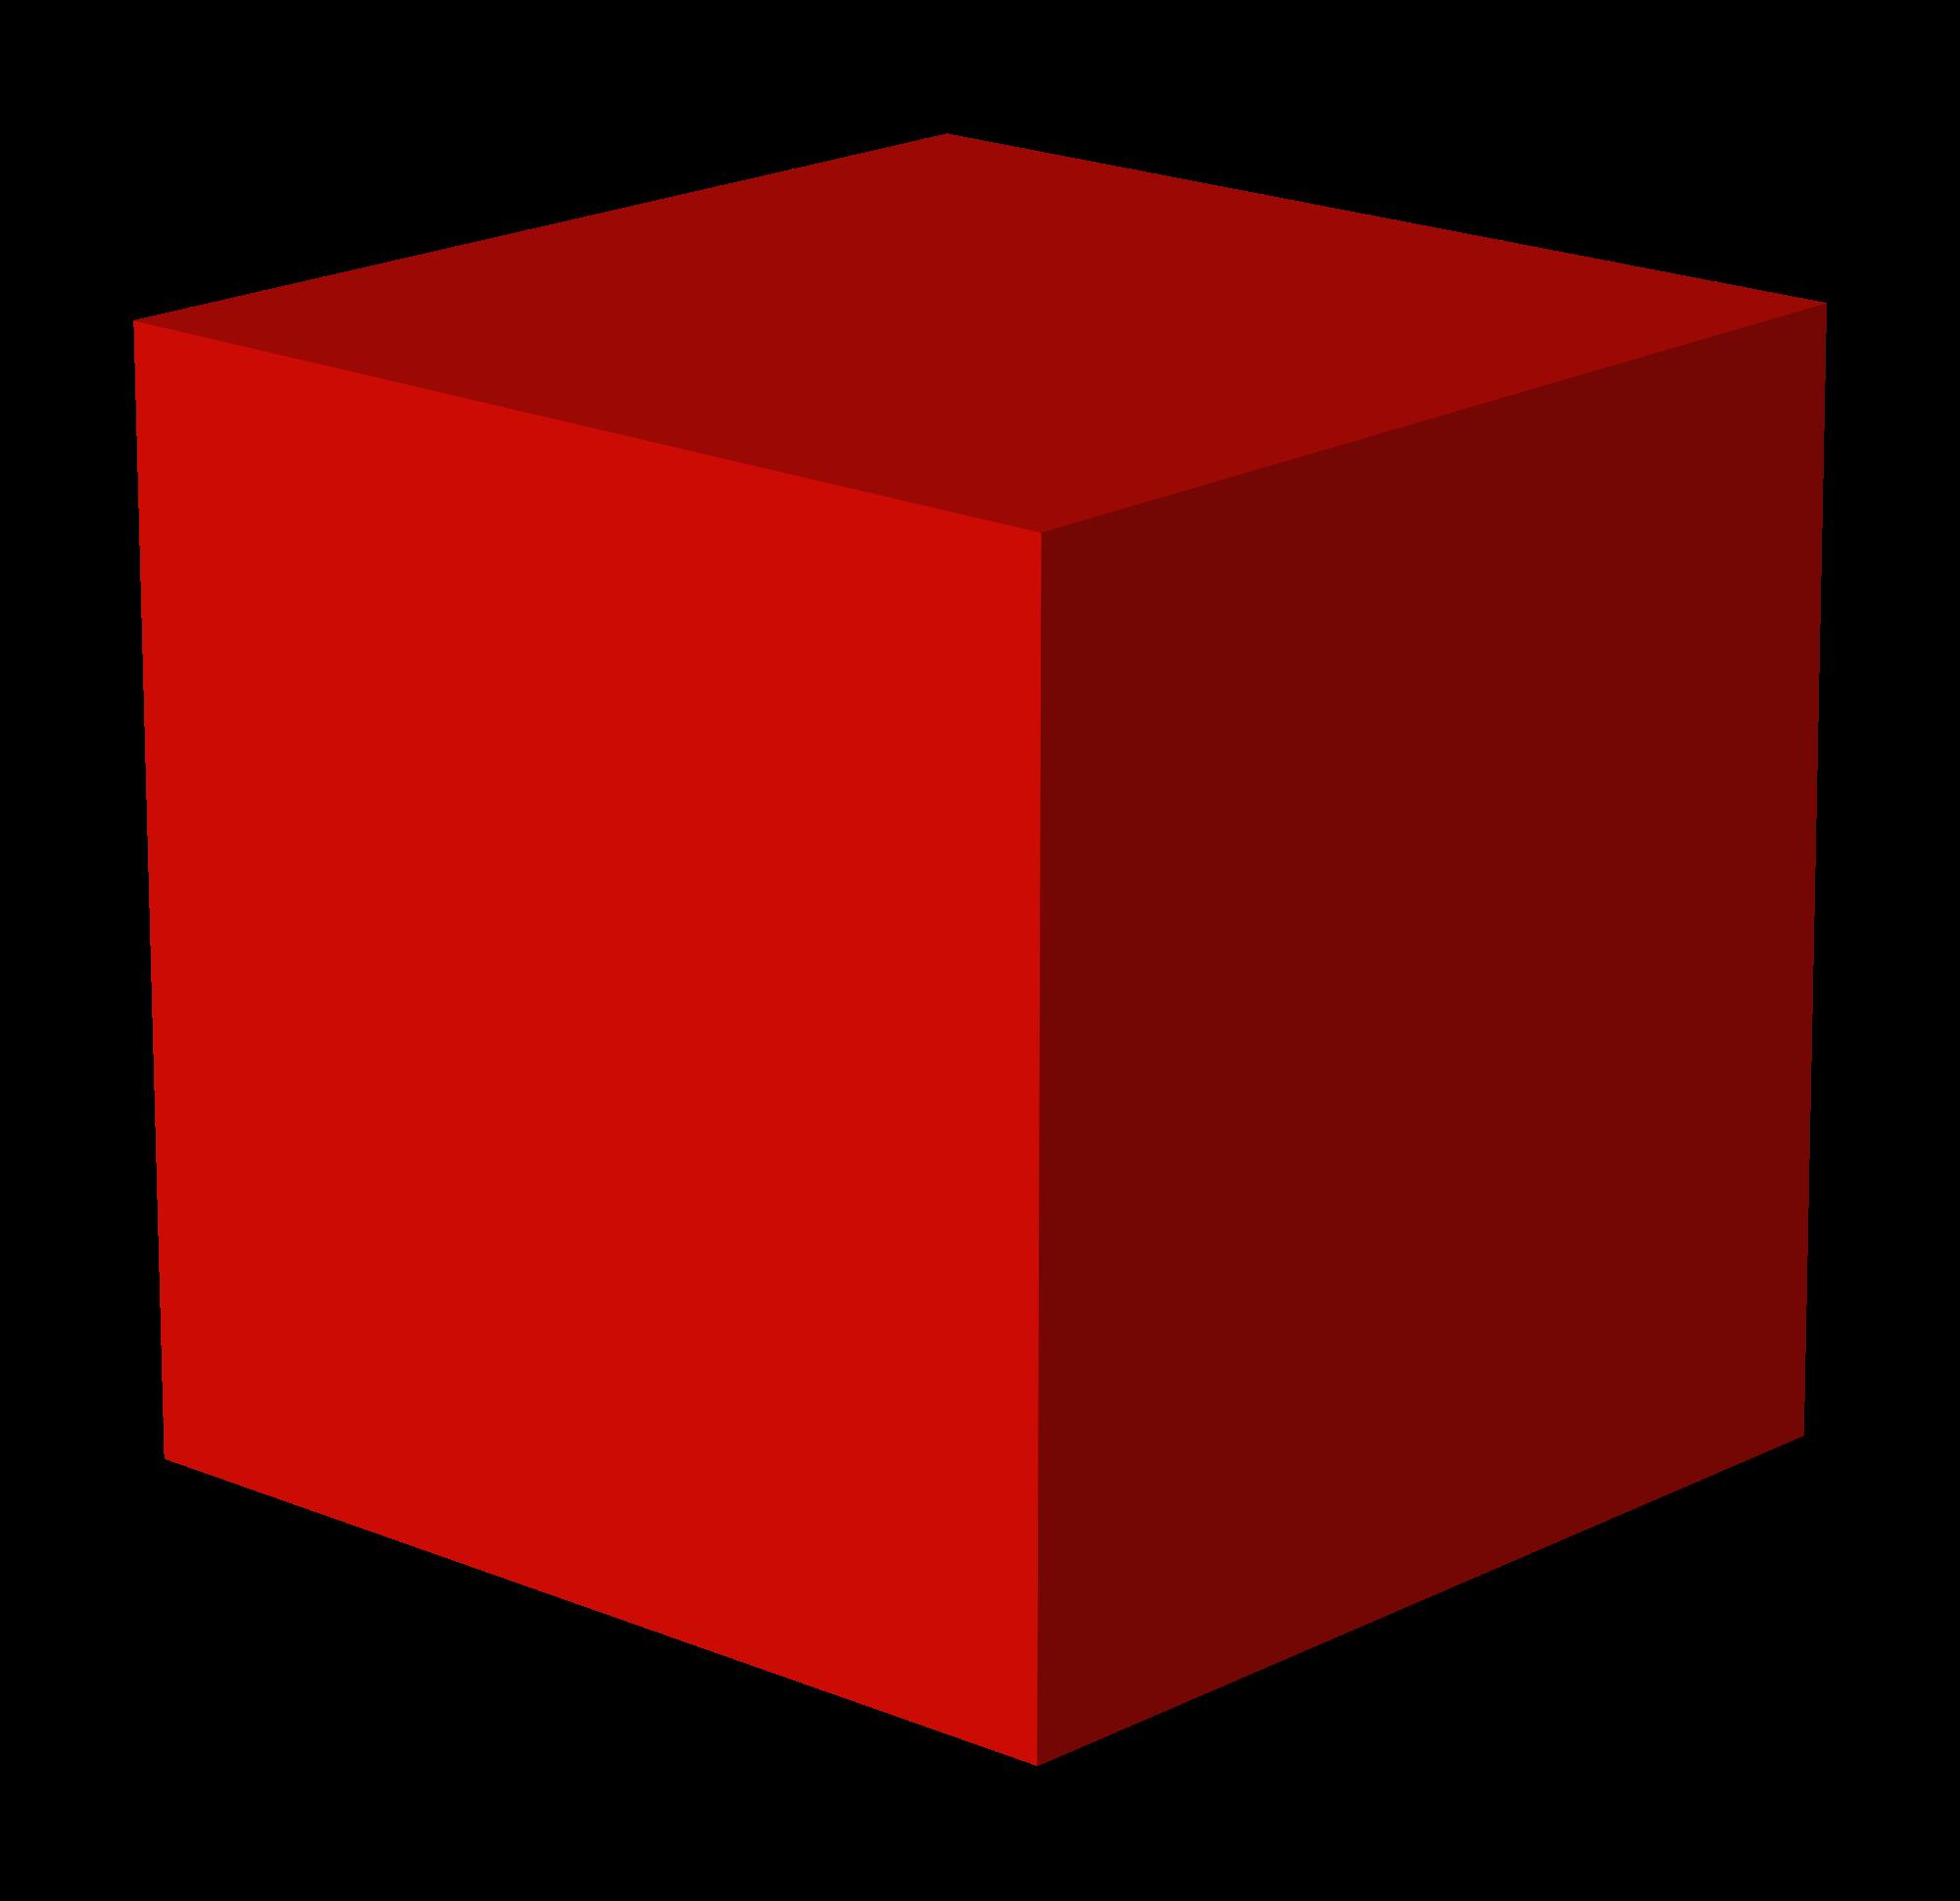 cube clipart dimensional